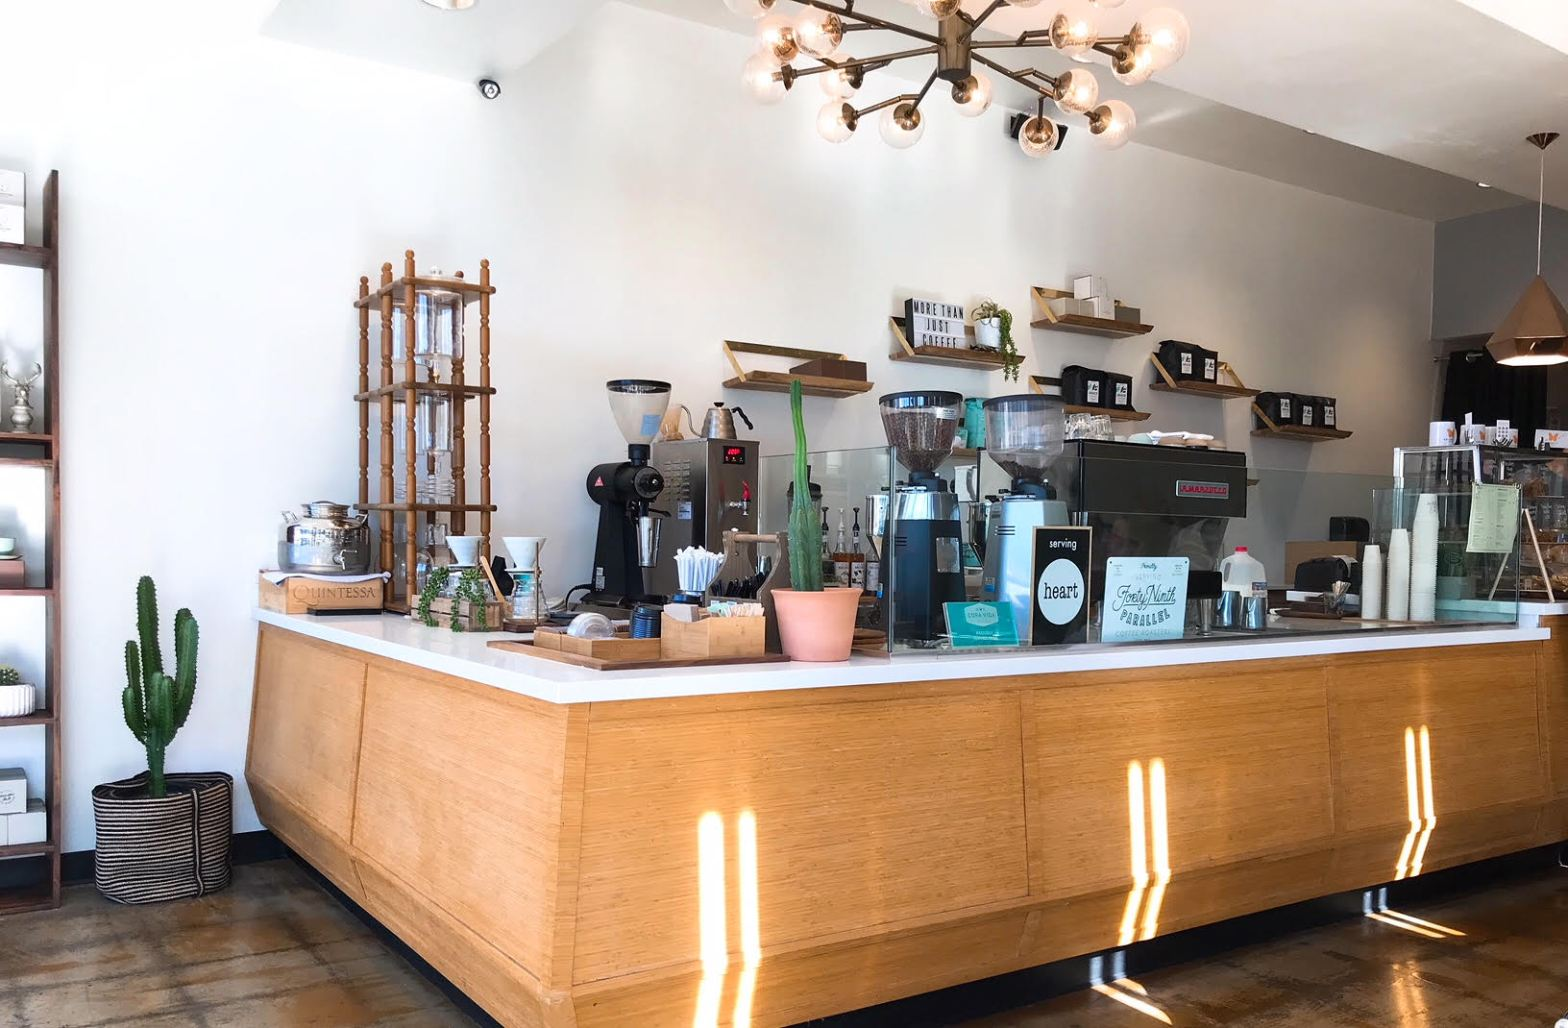 10 Best Coffee Shops in the U.S.